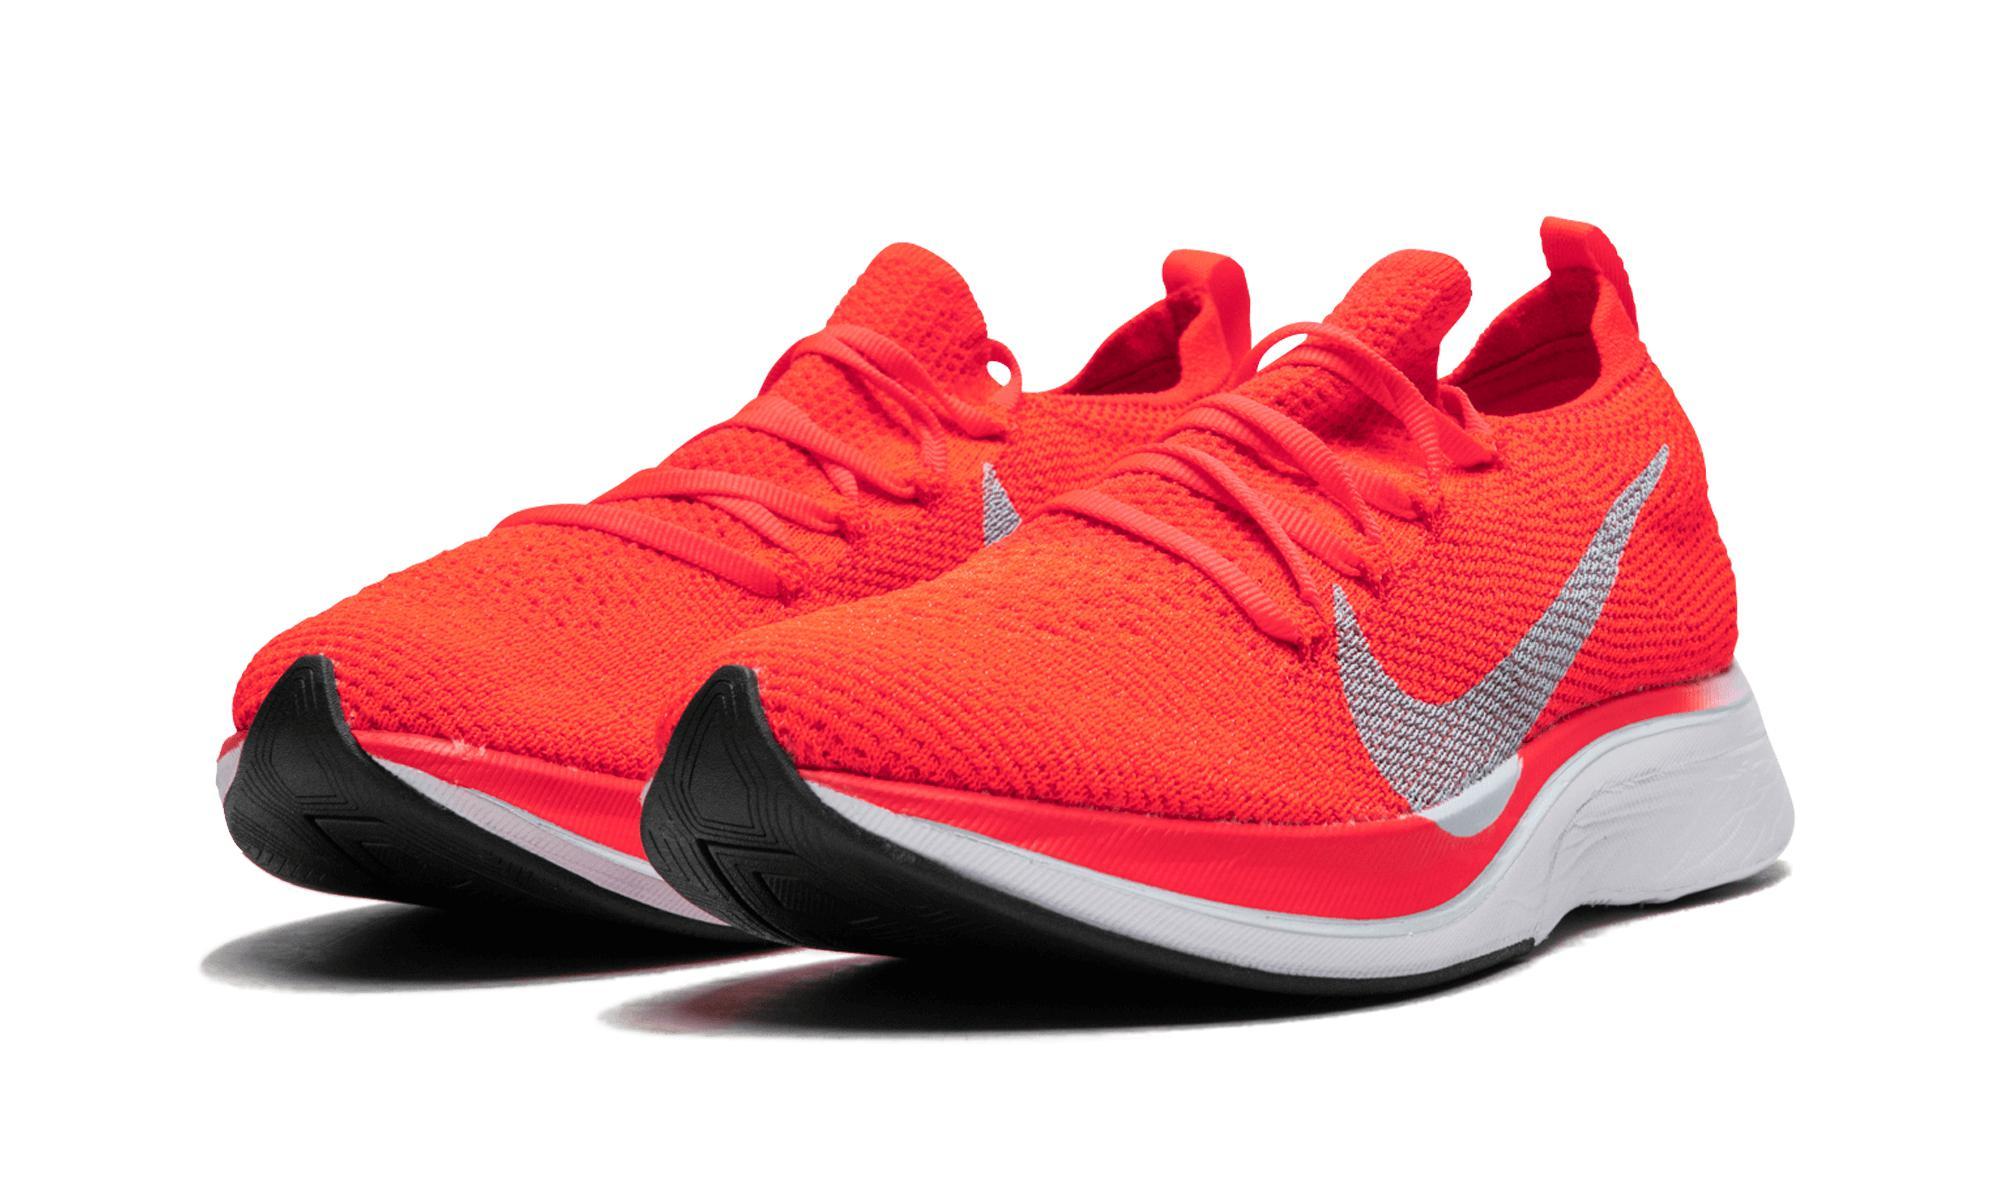 e16dbb022f89ed Nike Vaporfly 4% Flyknit in Red for Men - Lyst